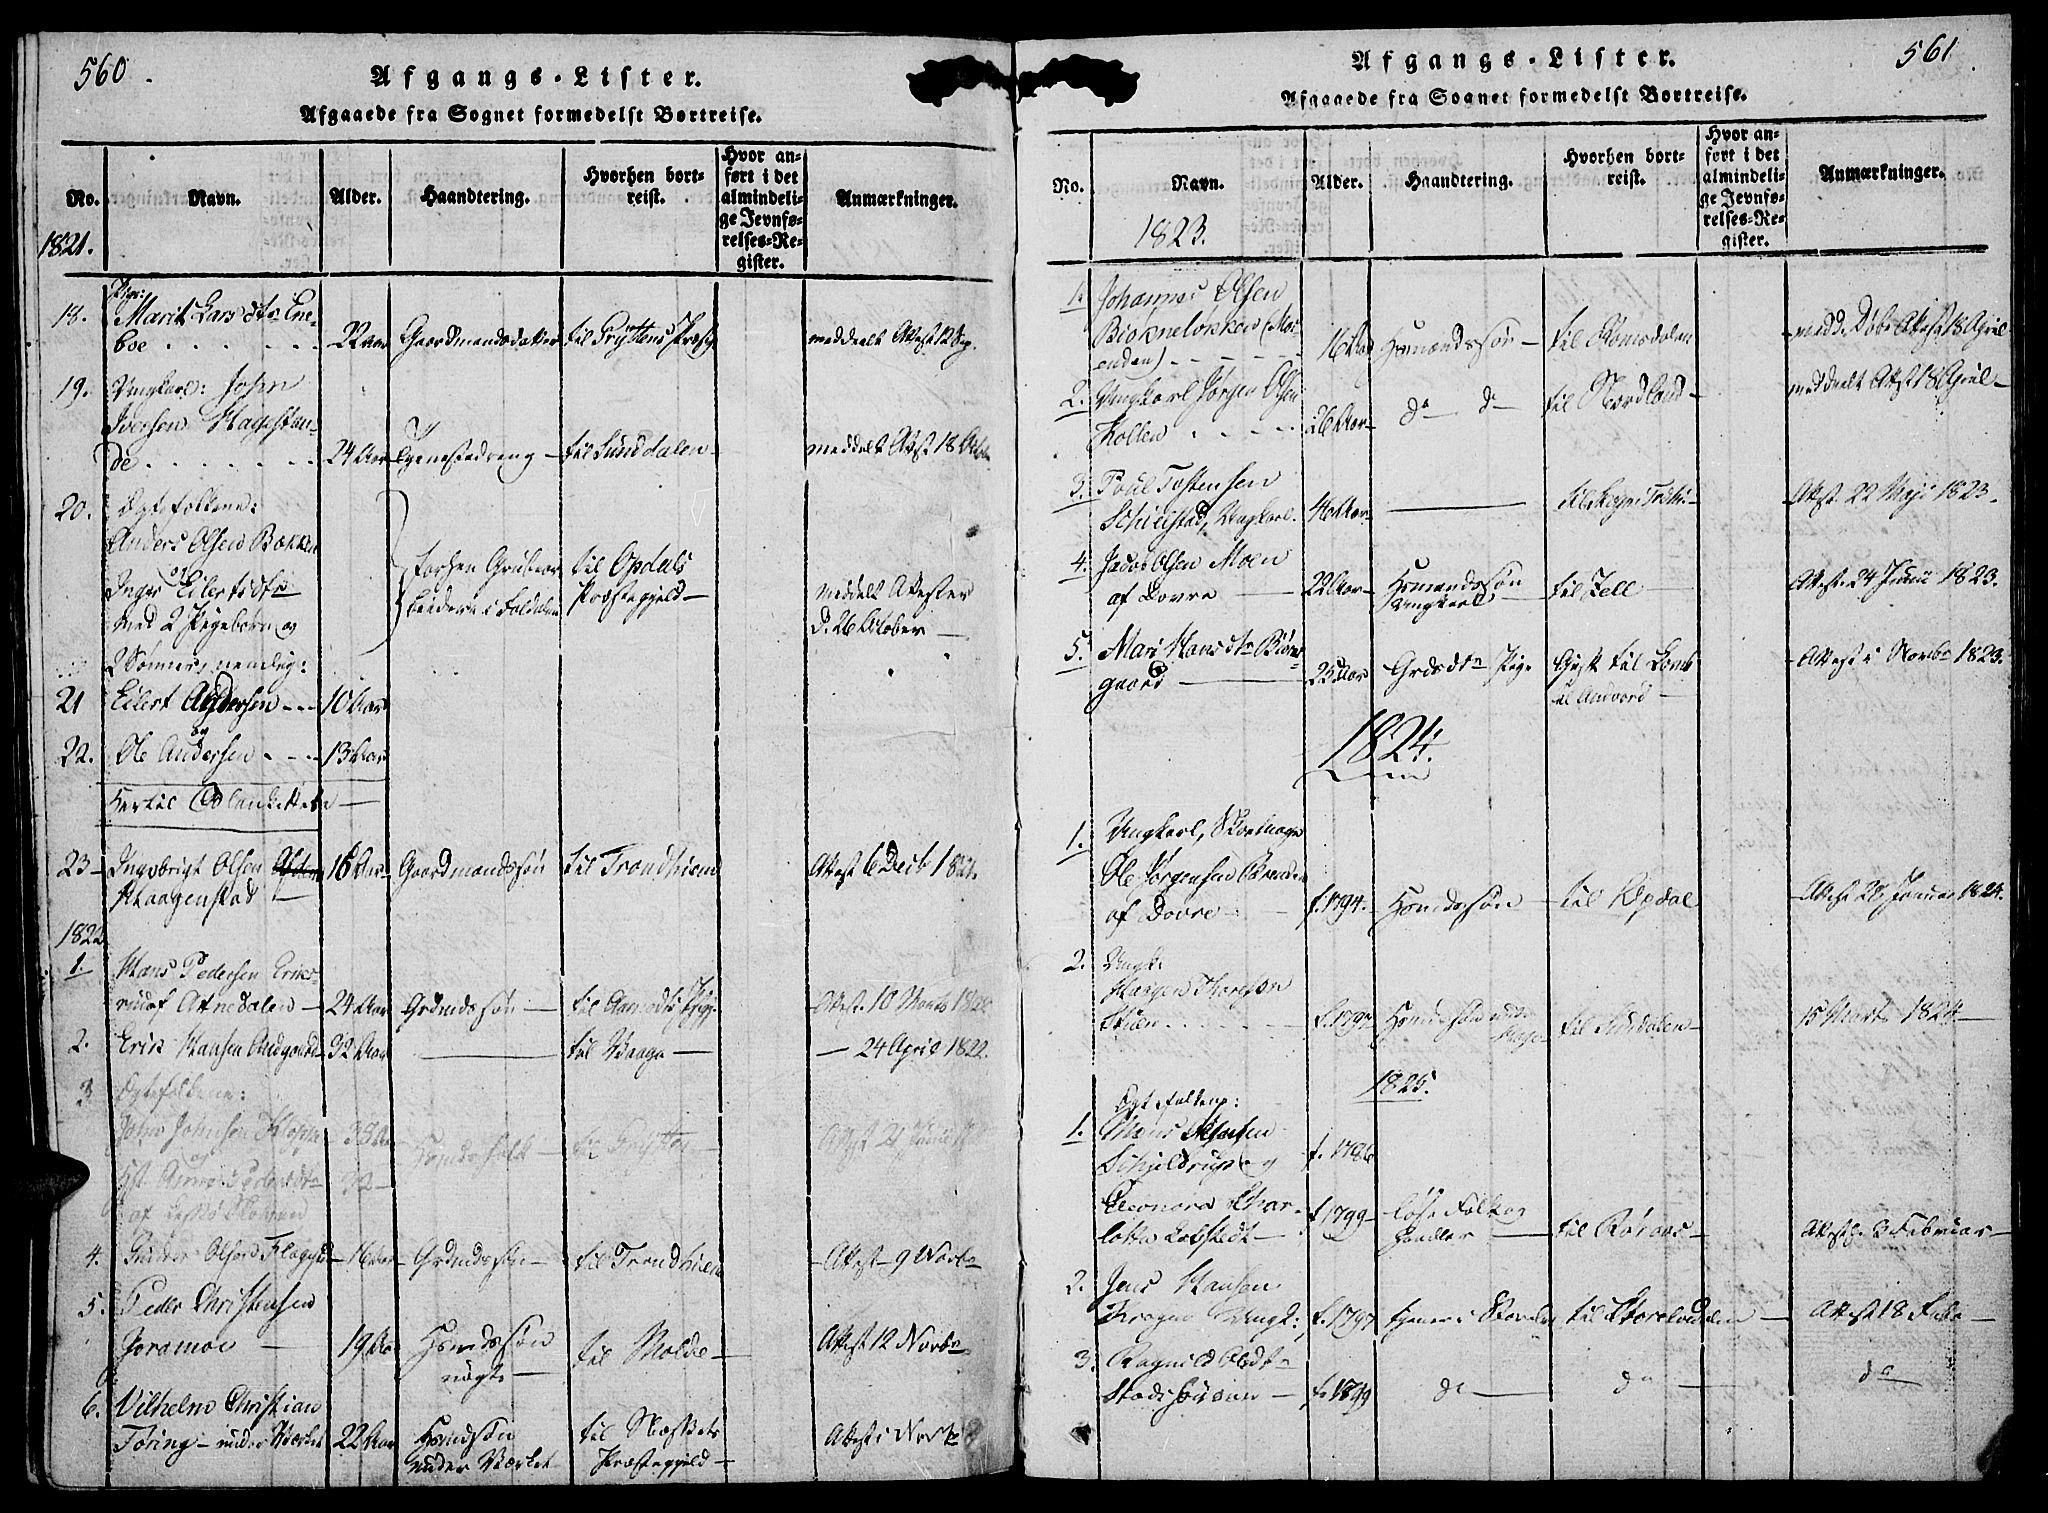 SAH, Lesja prestekontor, Parish register (official) no. 4, 1820-1829, p. 560-561